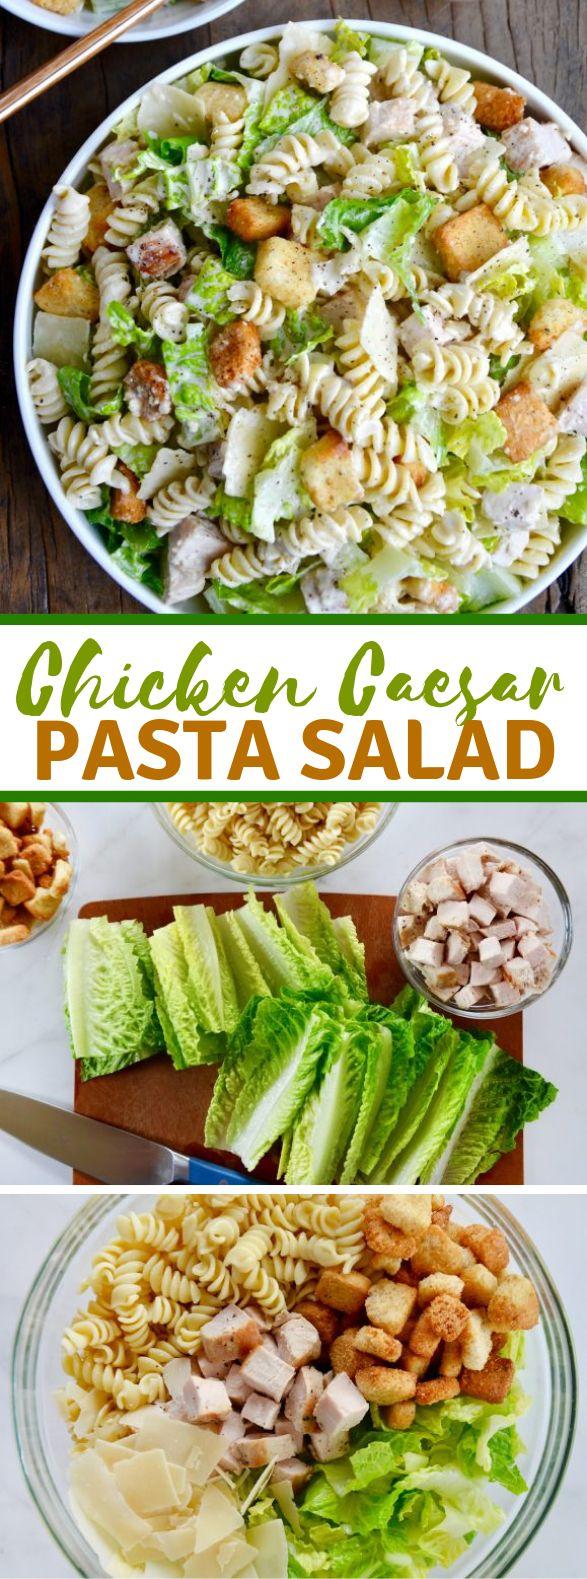 Chicken Caesar Pasta Salad #vegetarian #refreshingrecipe   – Vegetarian and Vegan Recipes